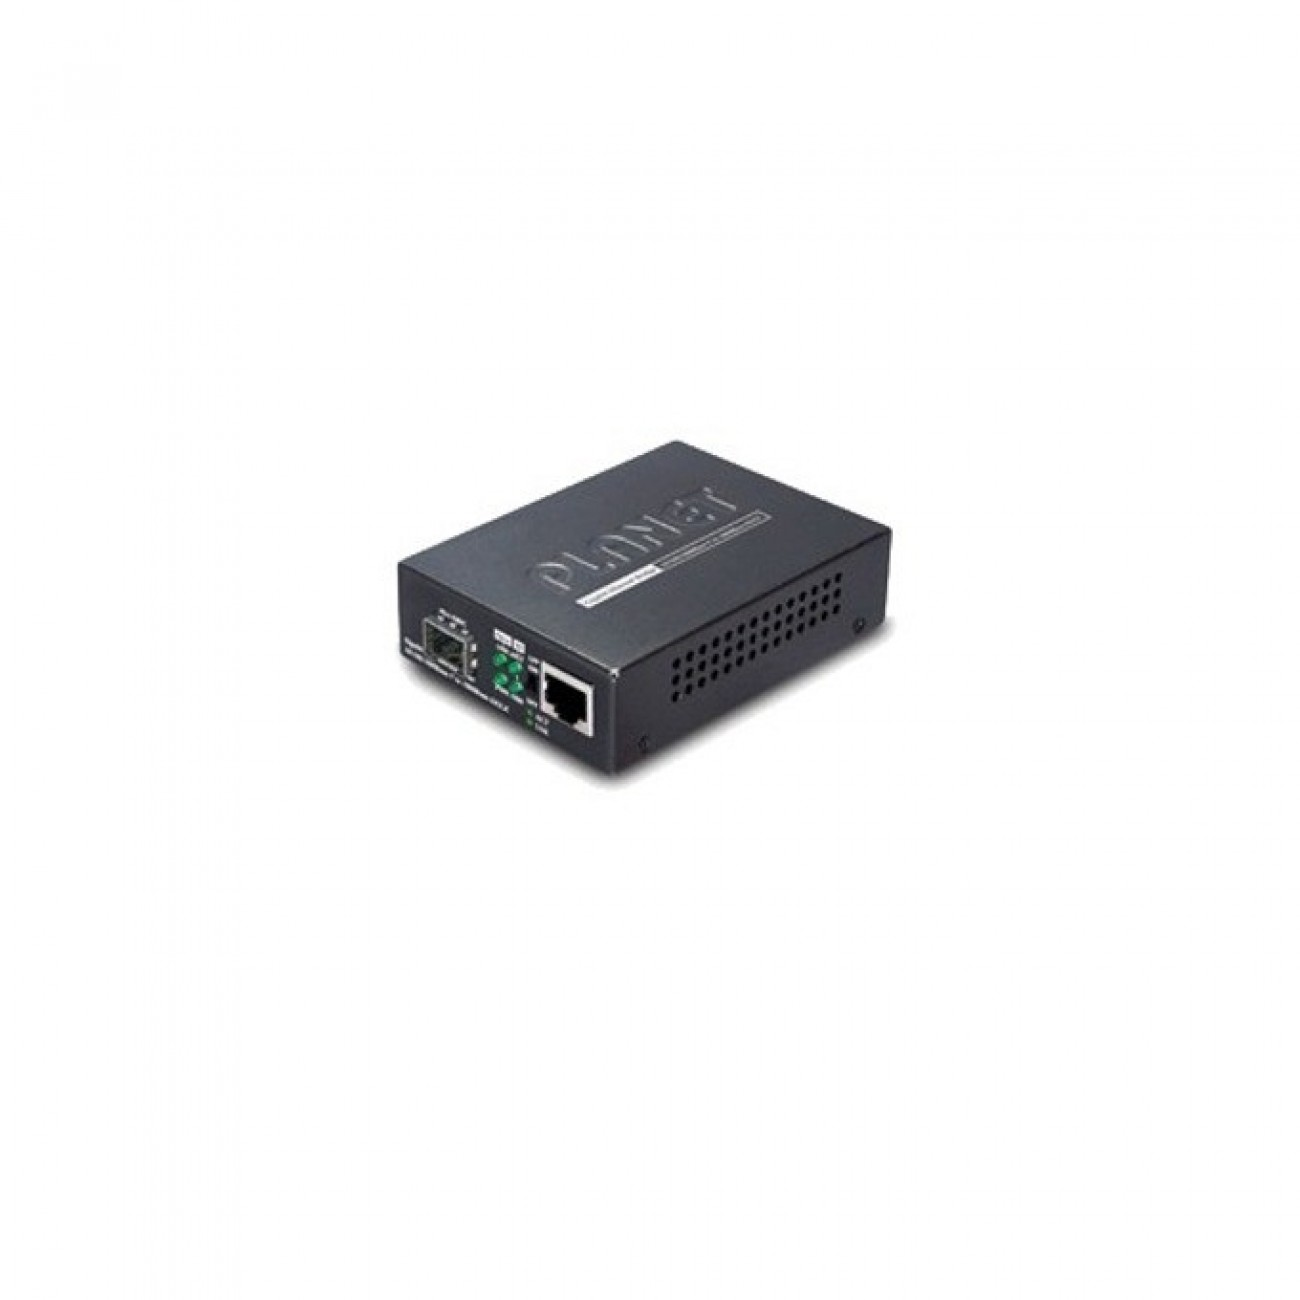 Planet GT-805A, от 100/1000Base-T към 1000Base- SFP Singlemode Gigabit Media Converter в Медиа конвертори -  | Alleop